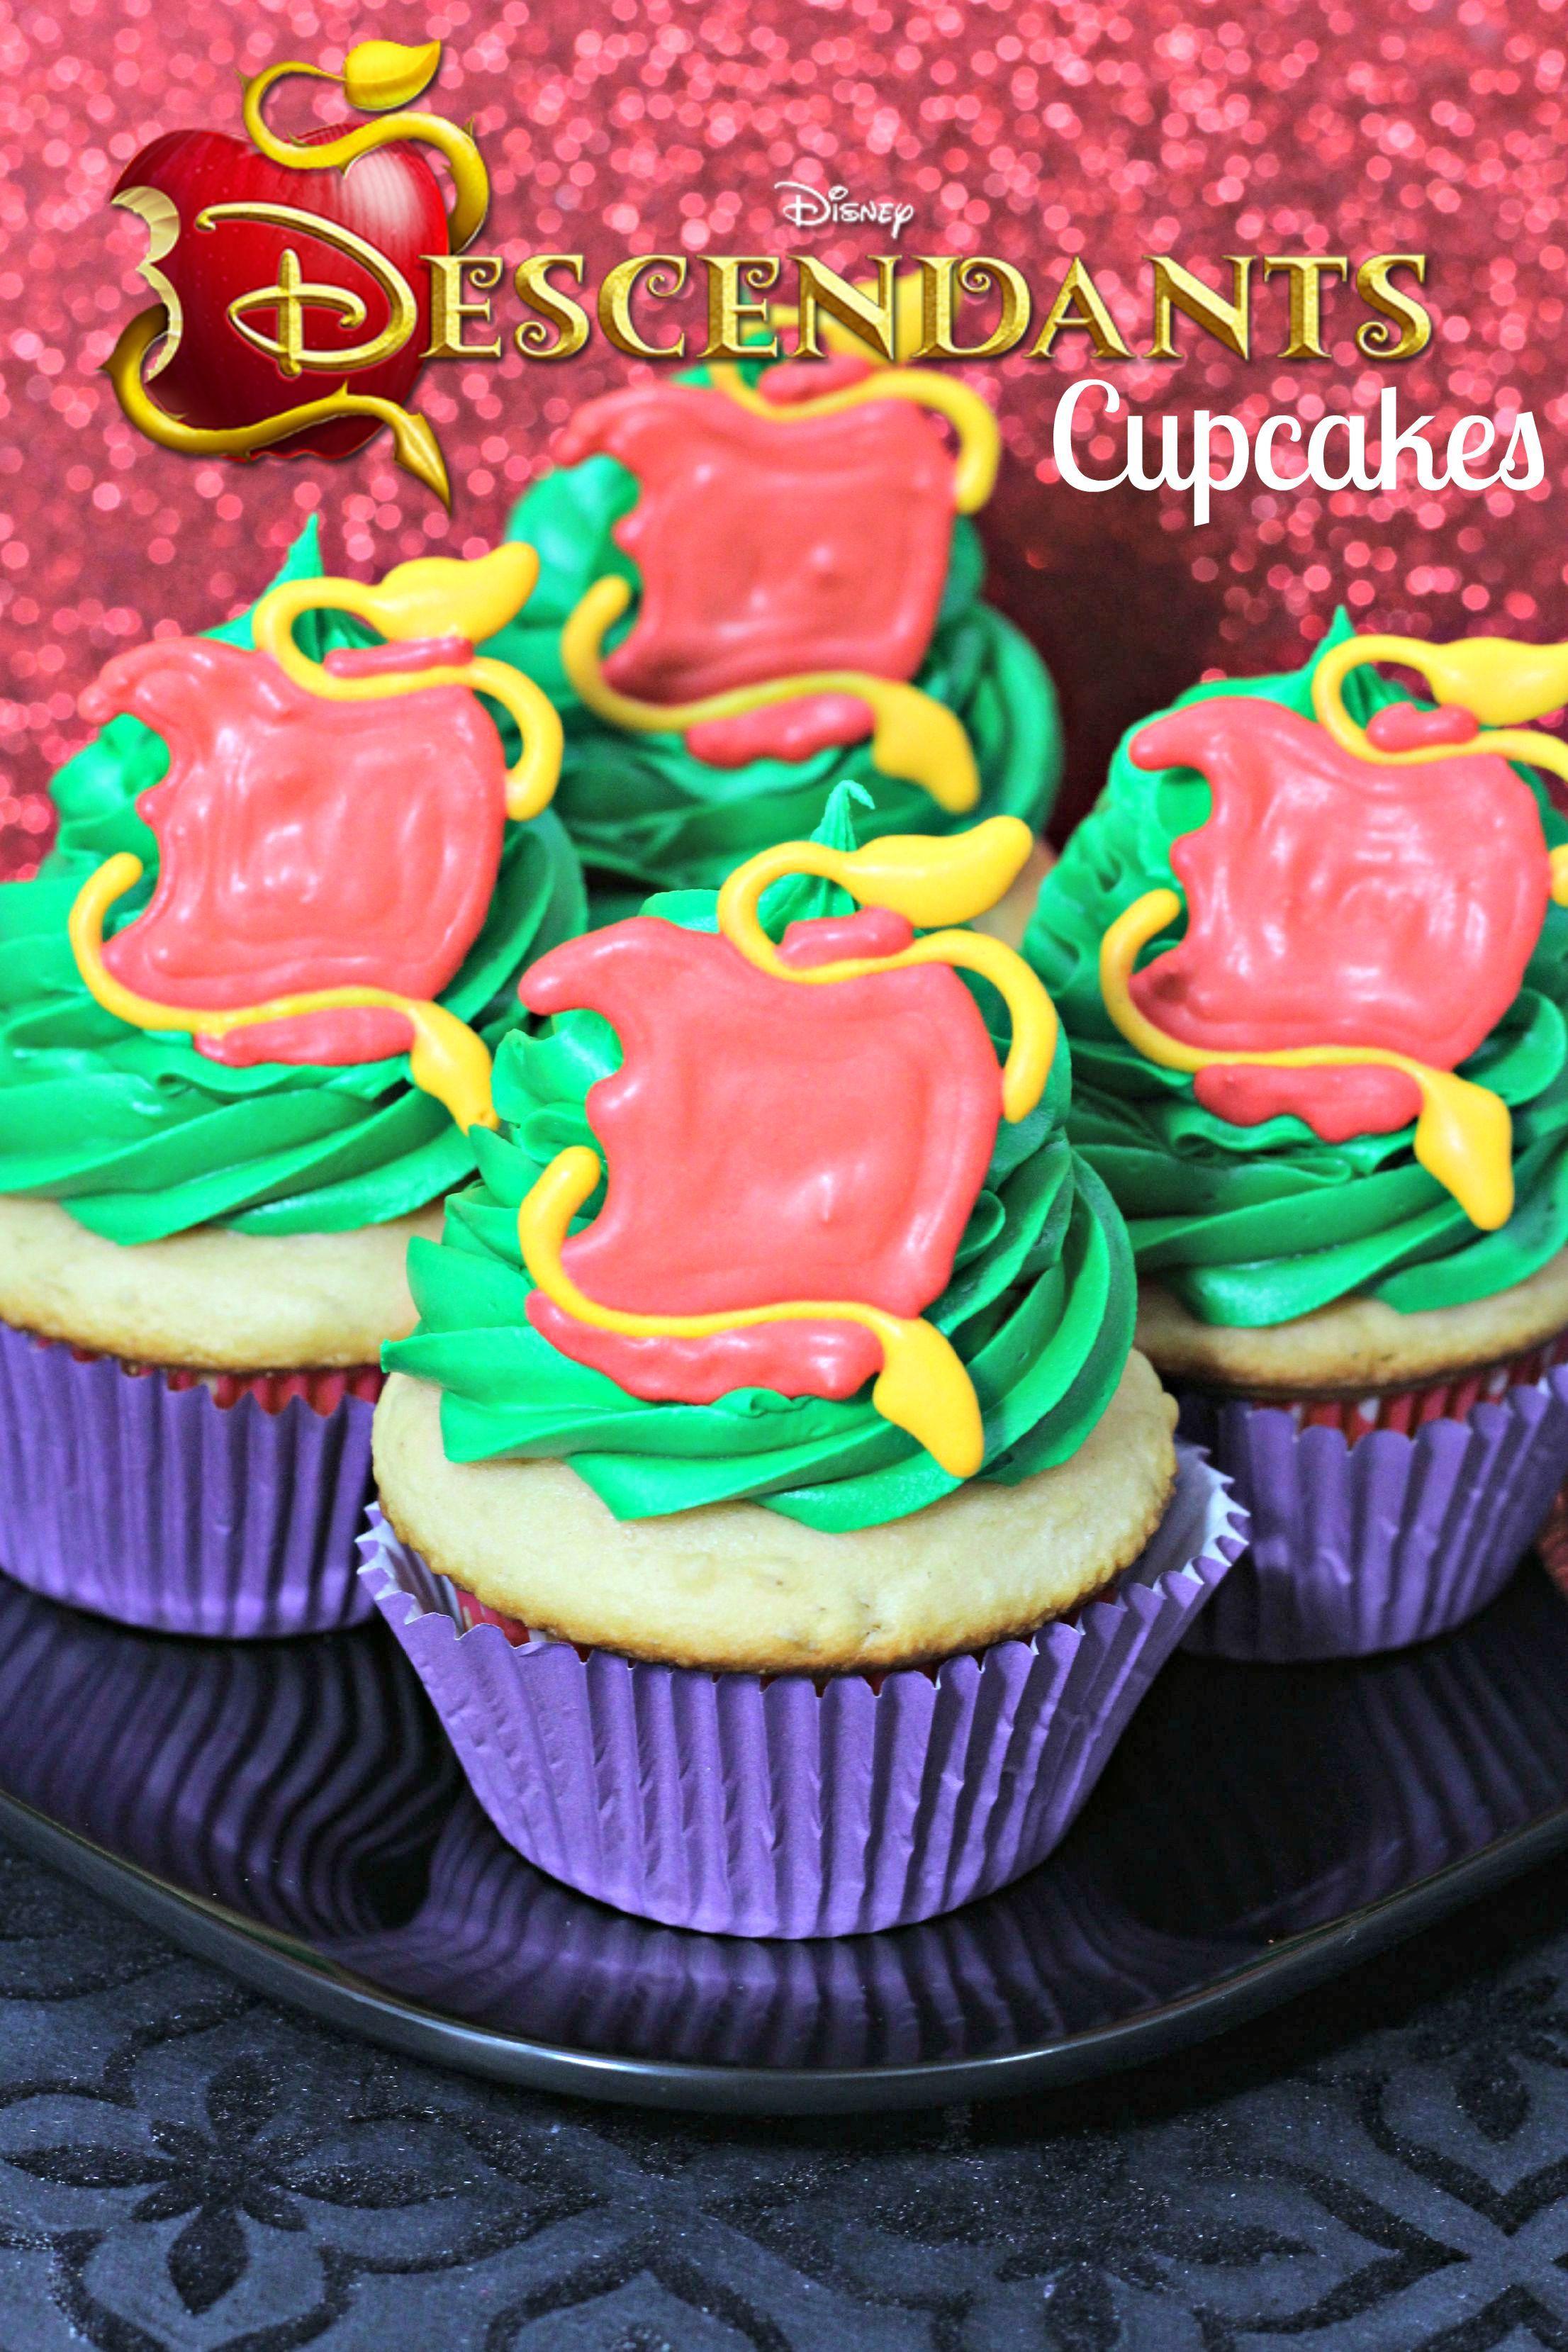 disney's descendants cupcakes - HD2212×3318